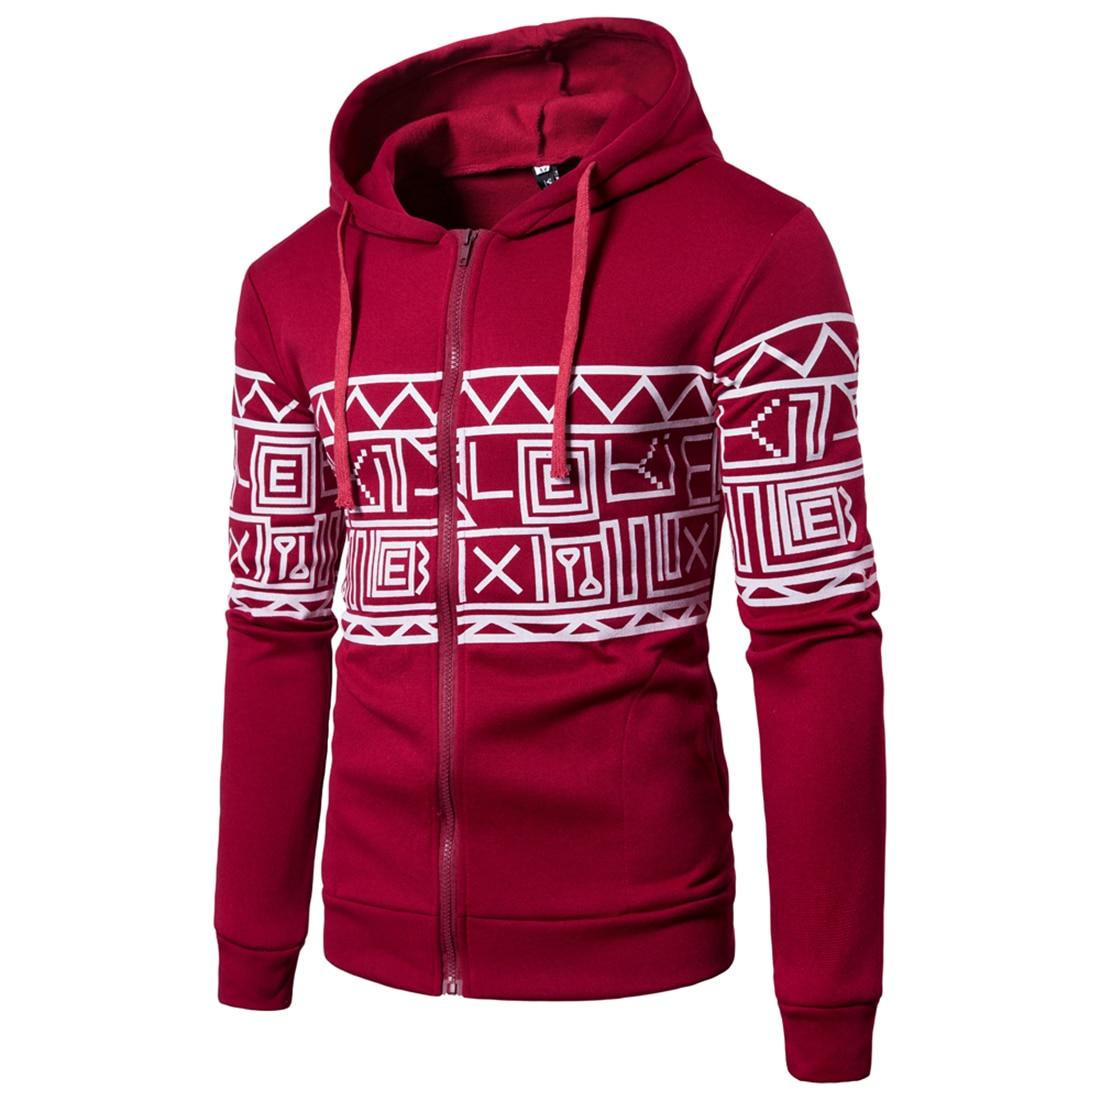 Mens Winter Hoodie Male Coat 2017 Warm Jacket Streetwear Geometry Print Hoodies Zipper Sweatshirt Zipper Sportswear HipHop Home